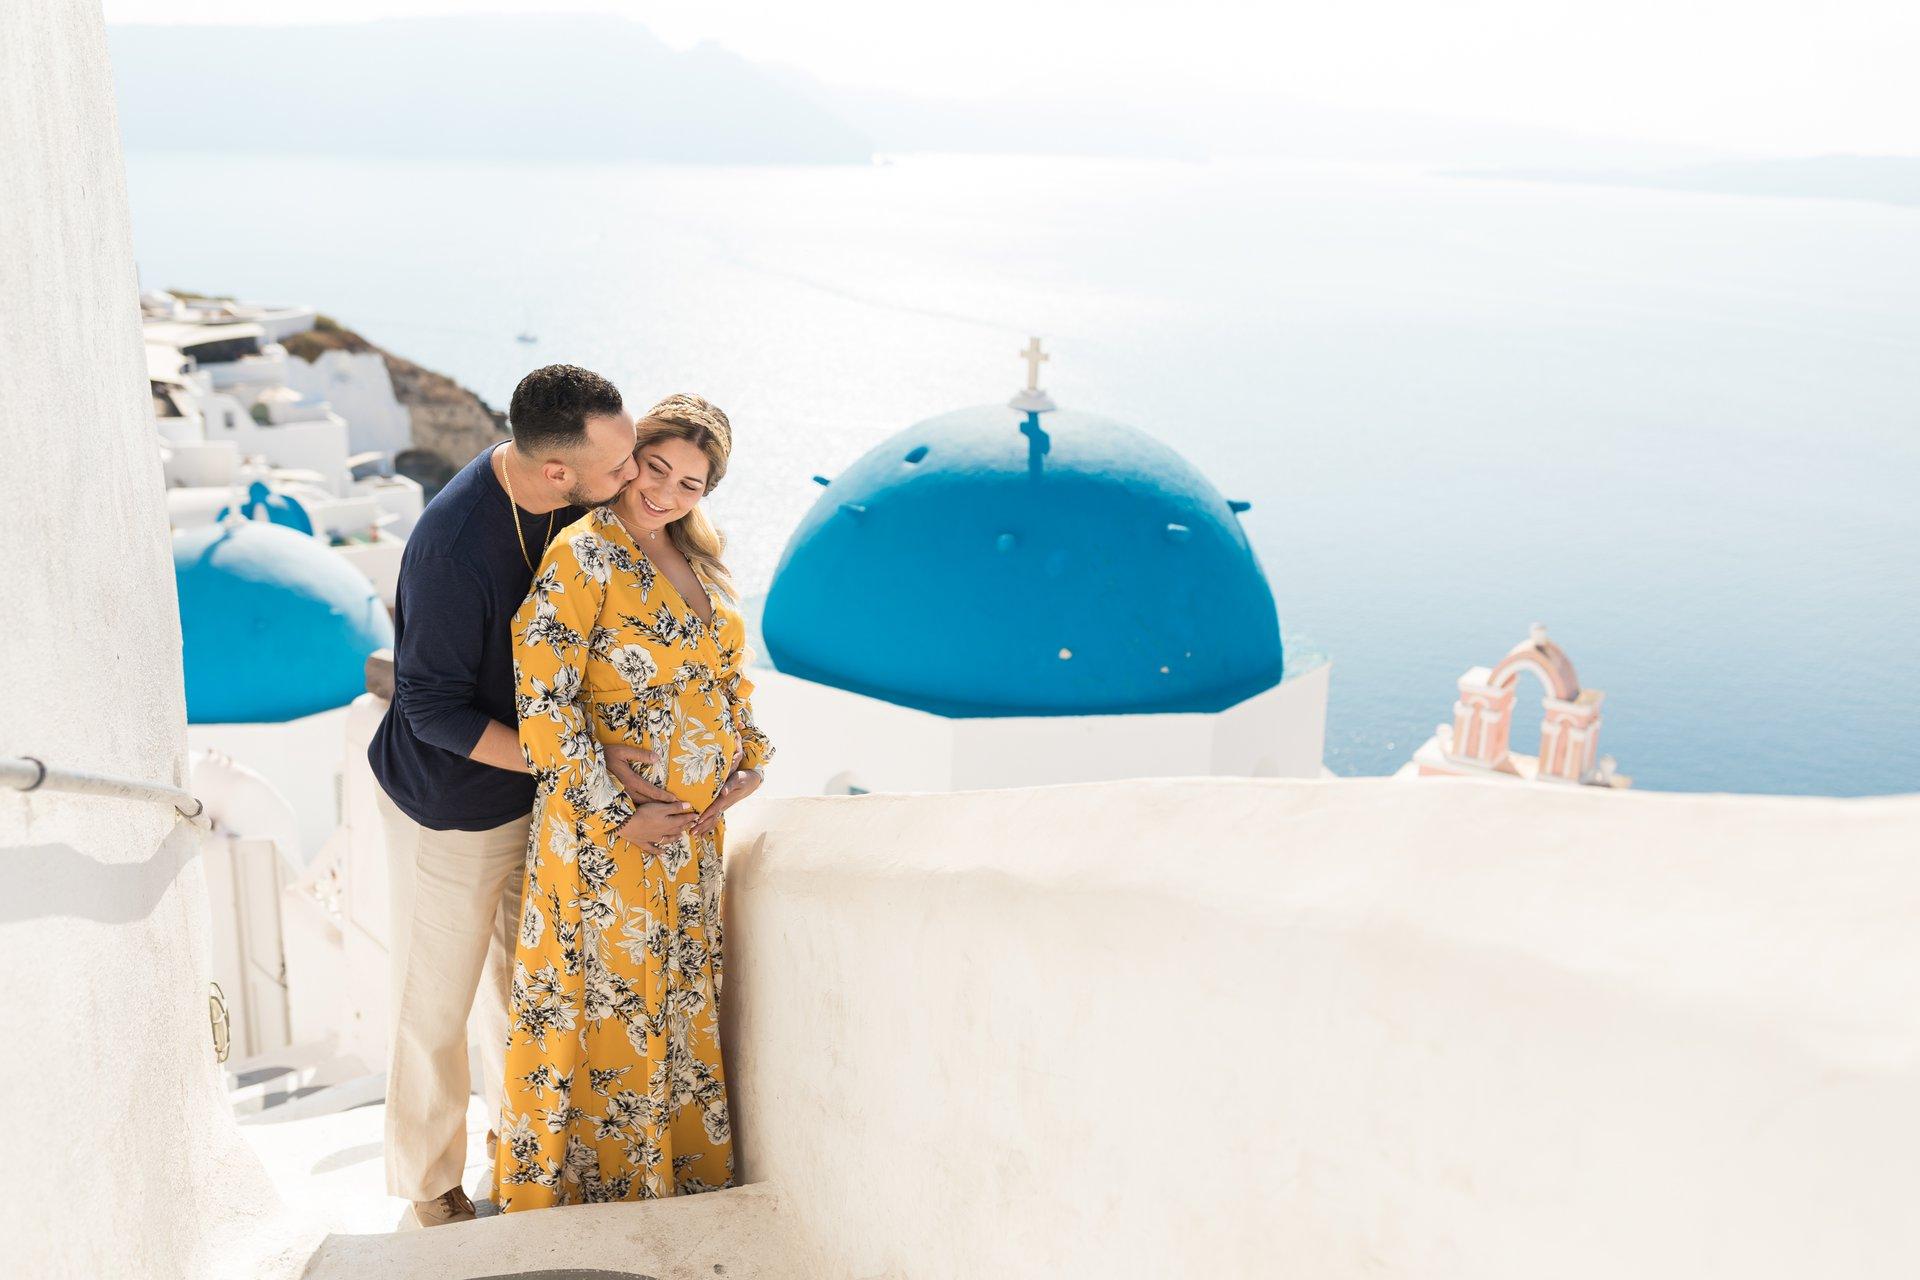 Santorini-Greece-travel-story-Flytographer-5